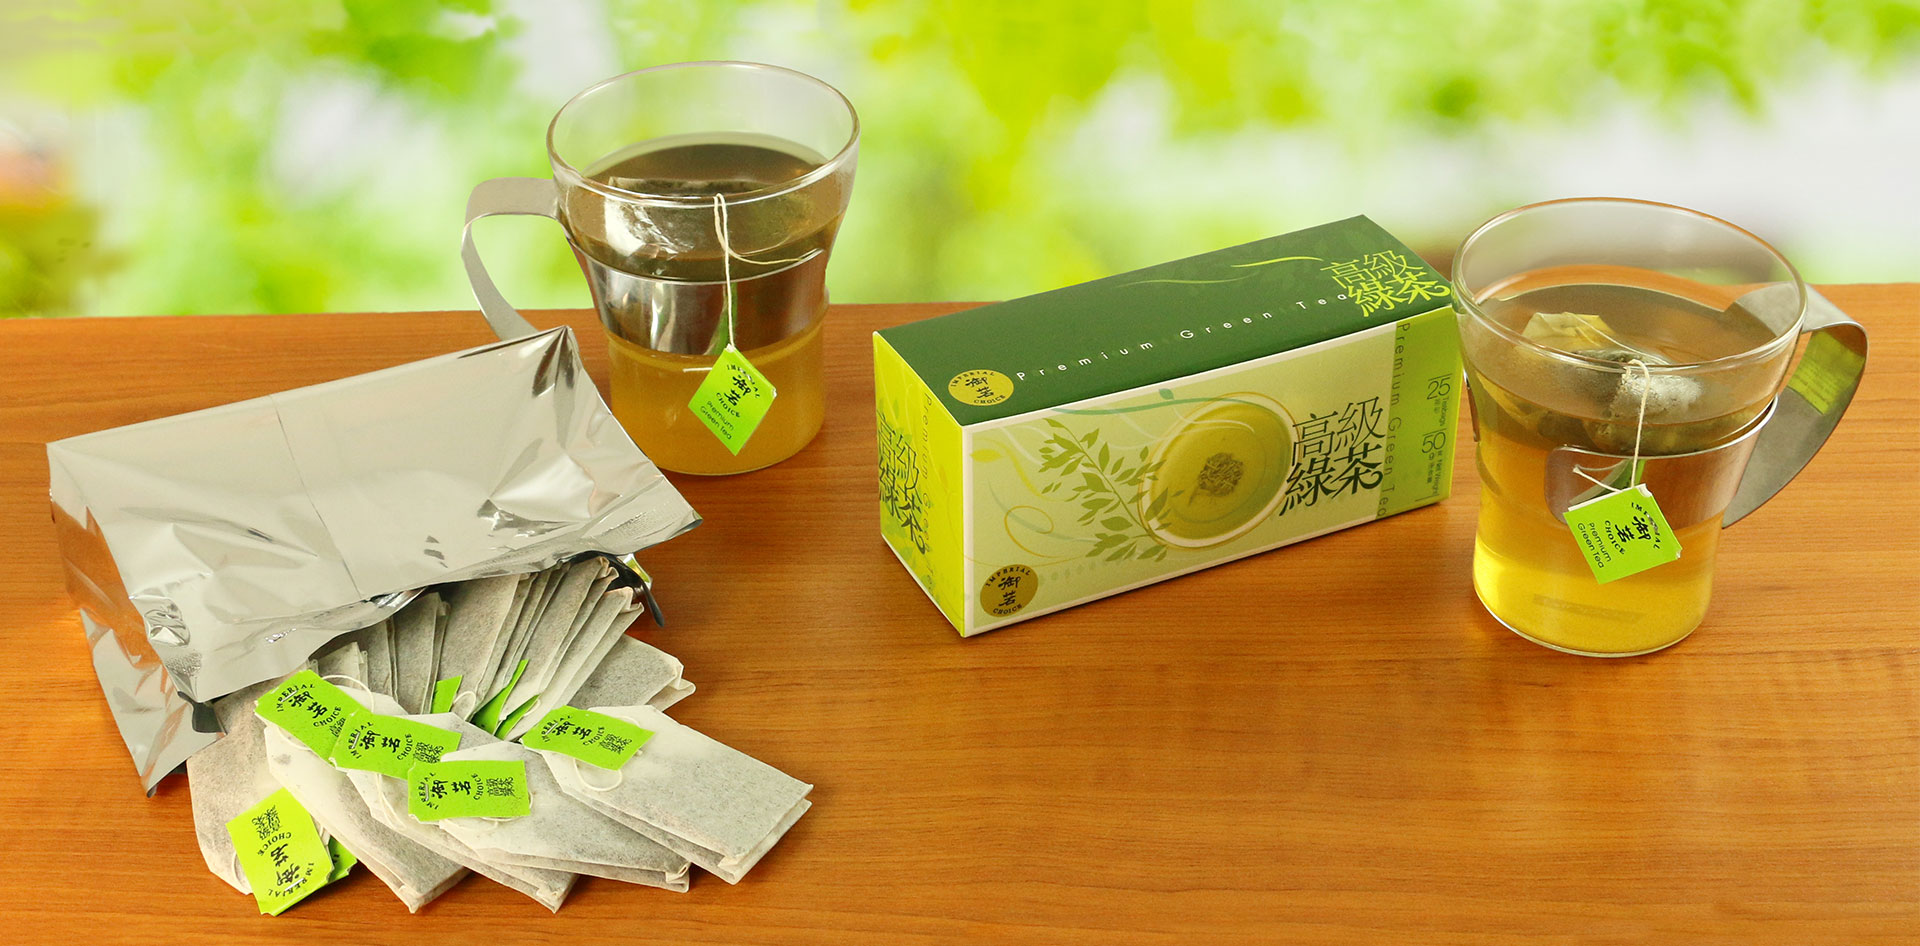 The Imperial Choice Healthy Green Tea